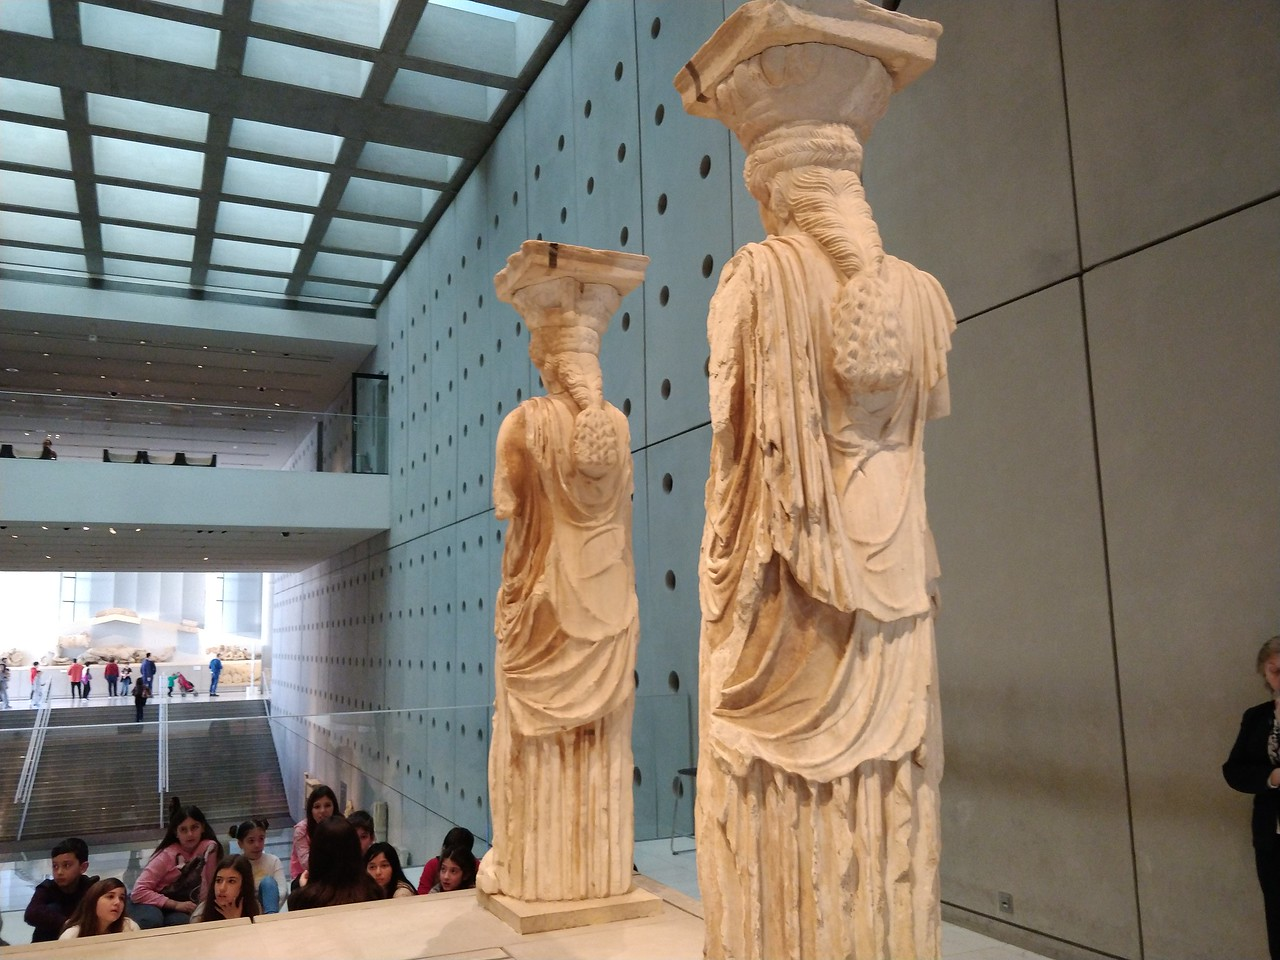 054 - Acropolis Museum - Caryatid Columns 2